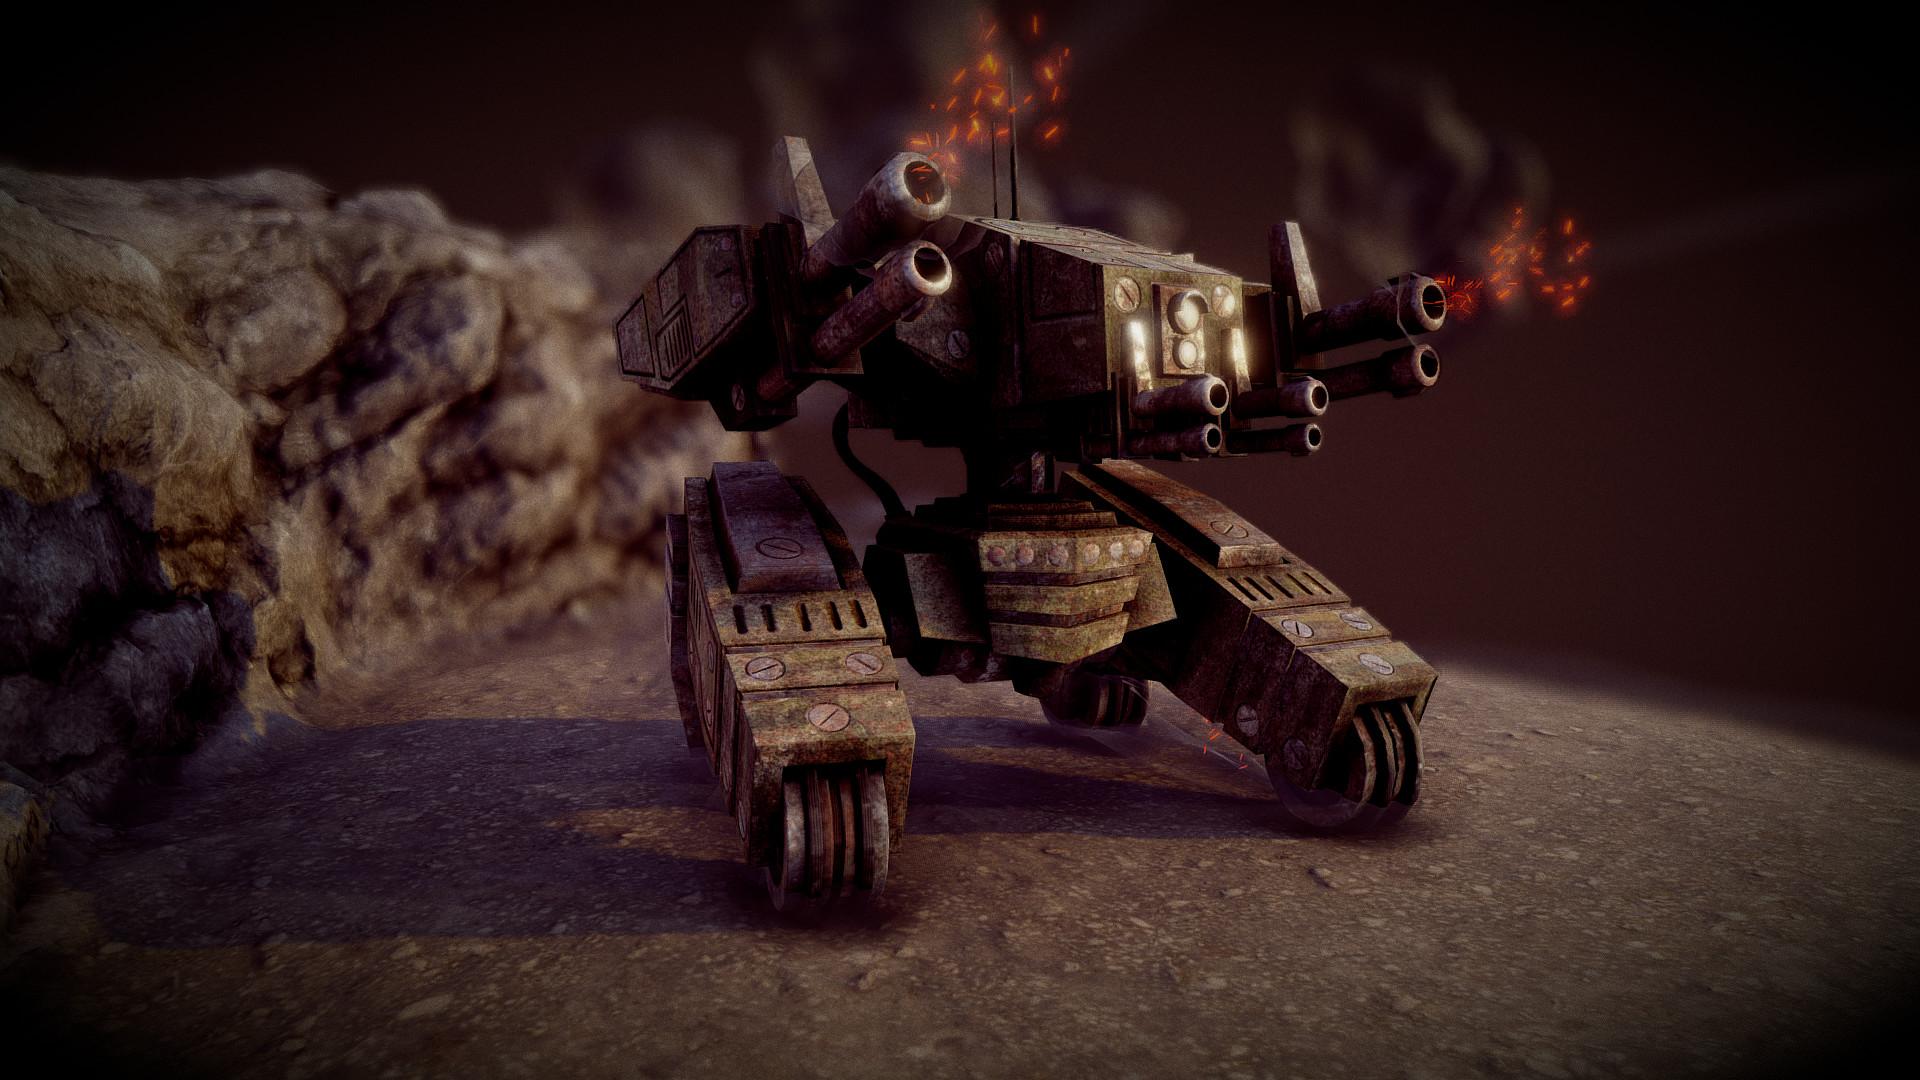 Ivan batalla sci fi war tank 1